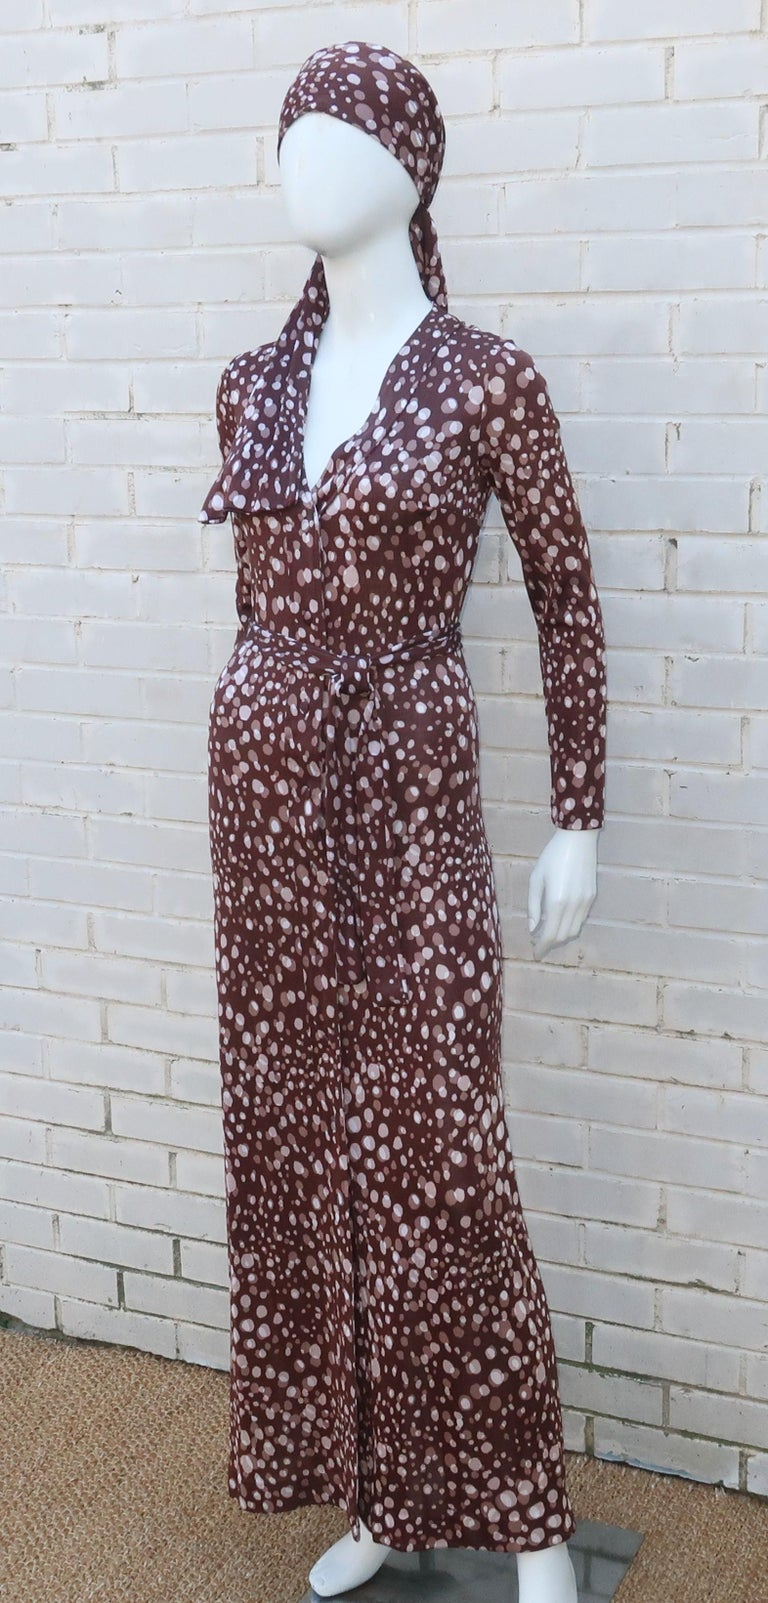 Women's Diane Von Furstenberg Brown Polka Dot Print Maxi Dress With Scarf, 1970's For Sale